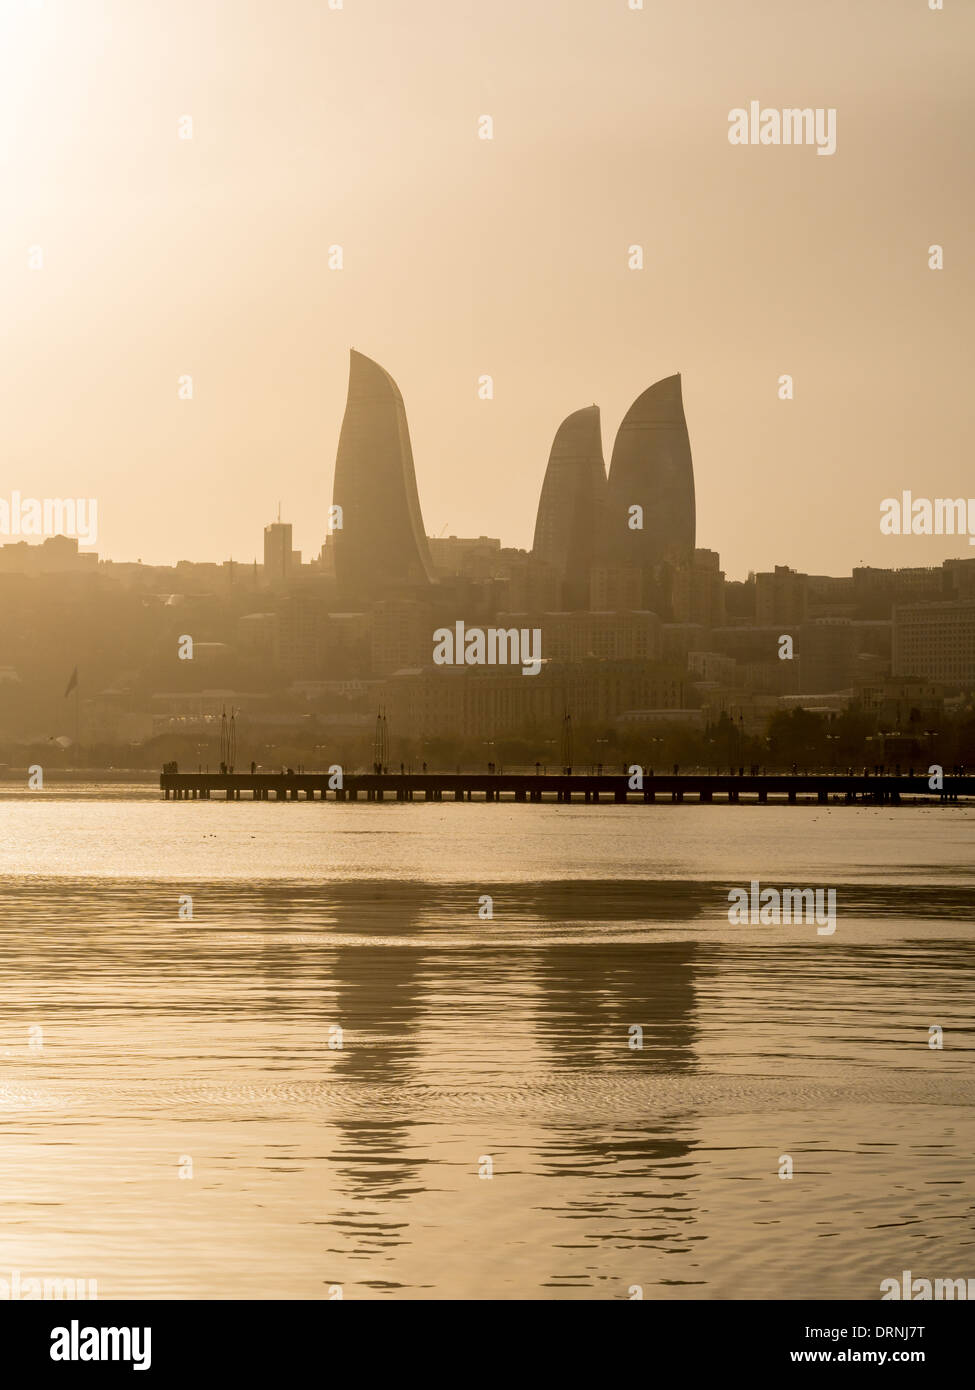 Baku, Azerbaijan, seen from the Baku Boulevard. Stock Photo